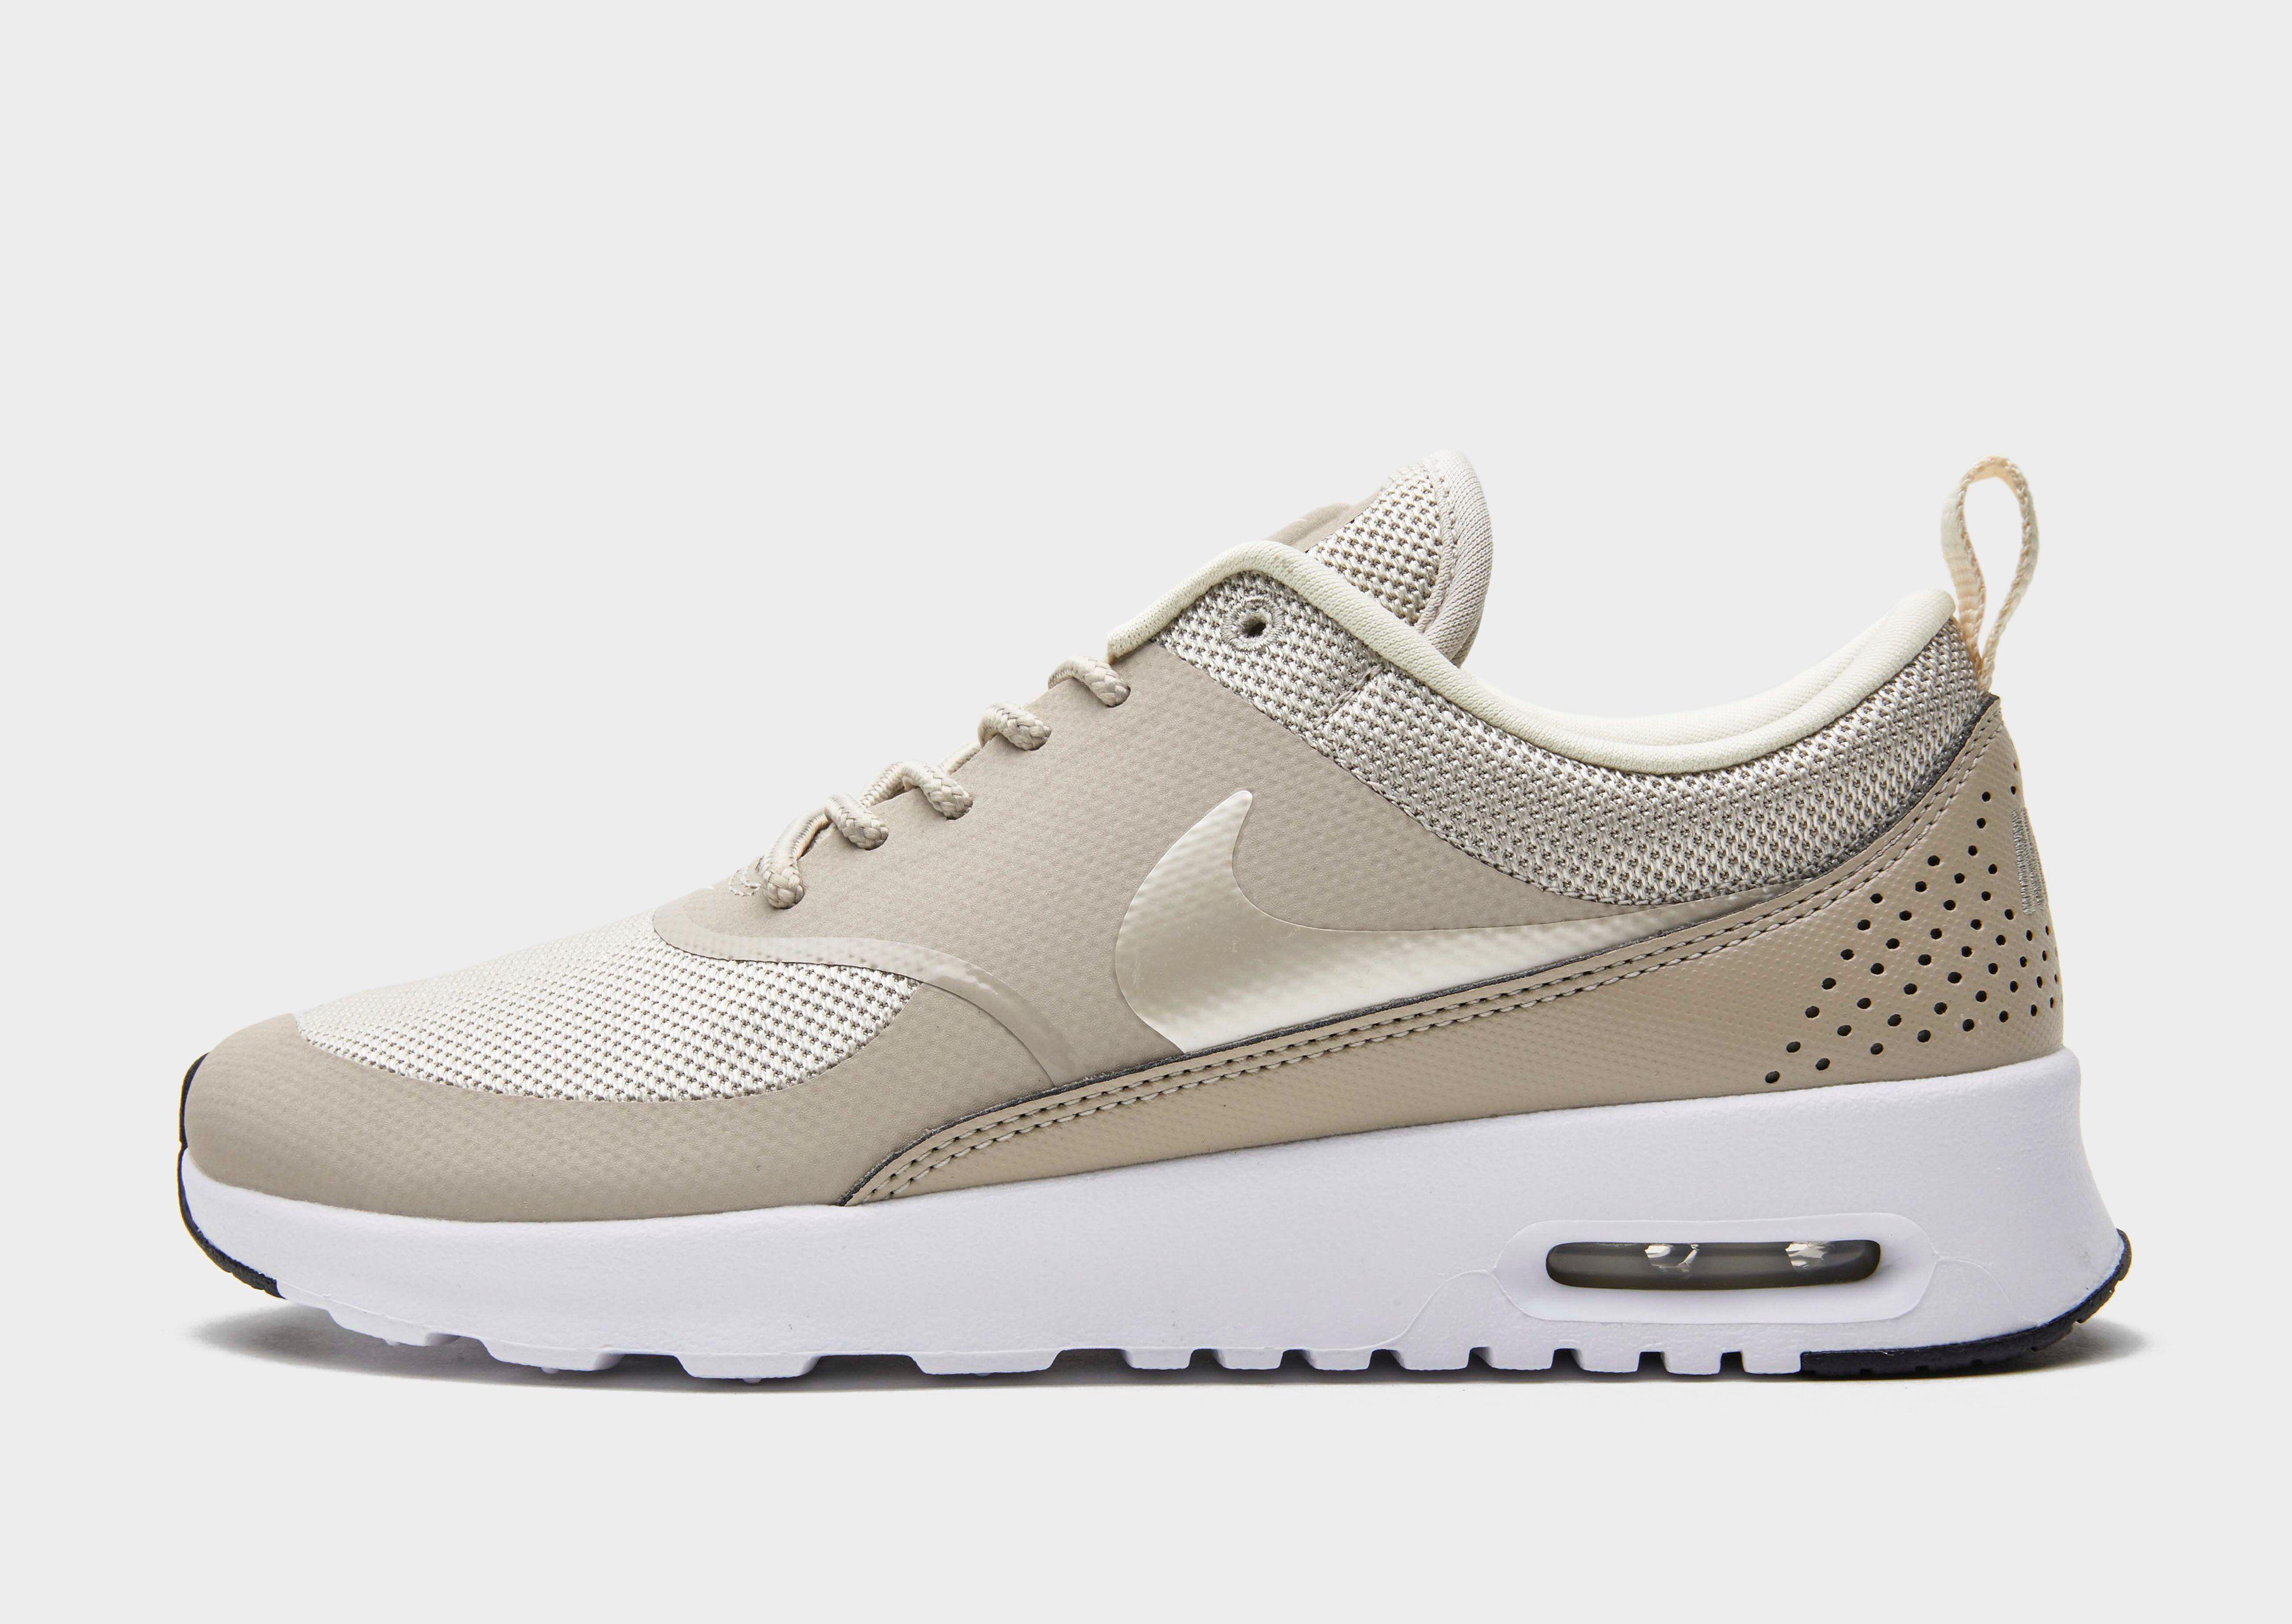 69c4f6ee38e865 NIKE Nike Air Max Thea Women s Shoe